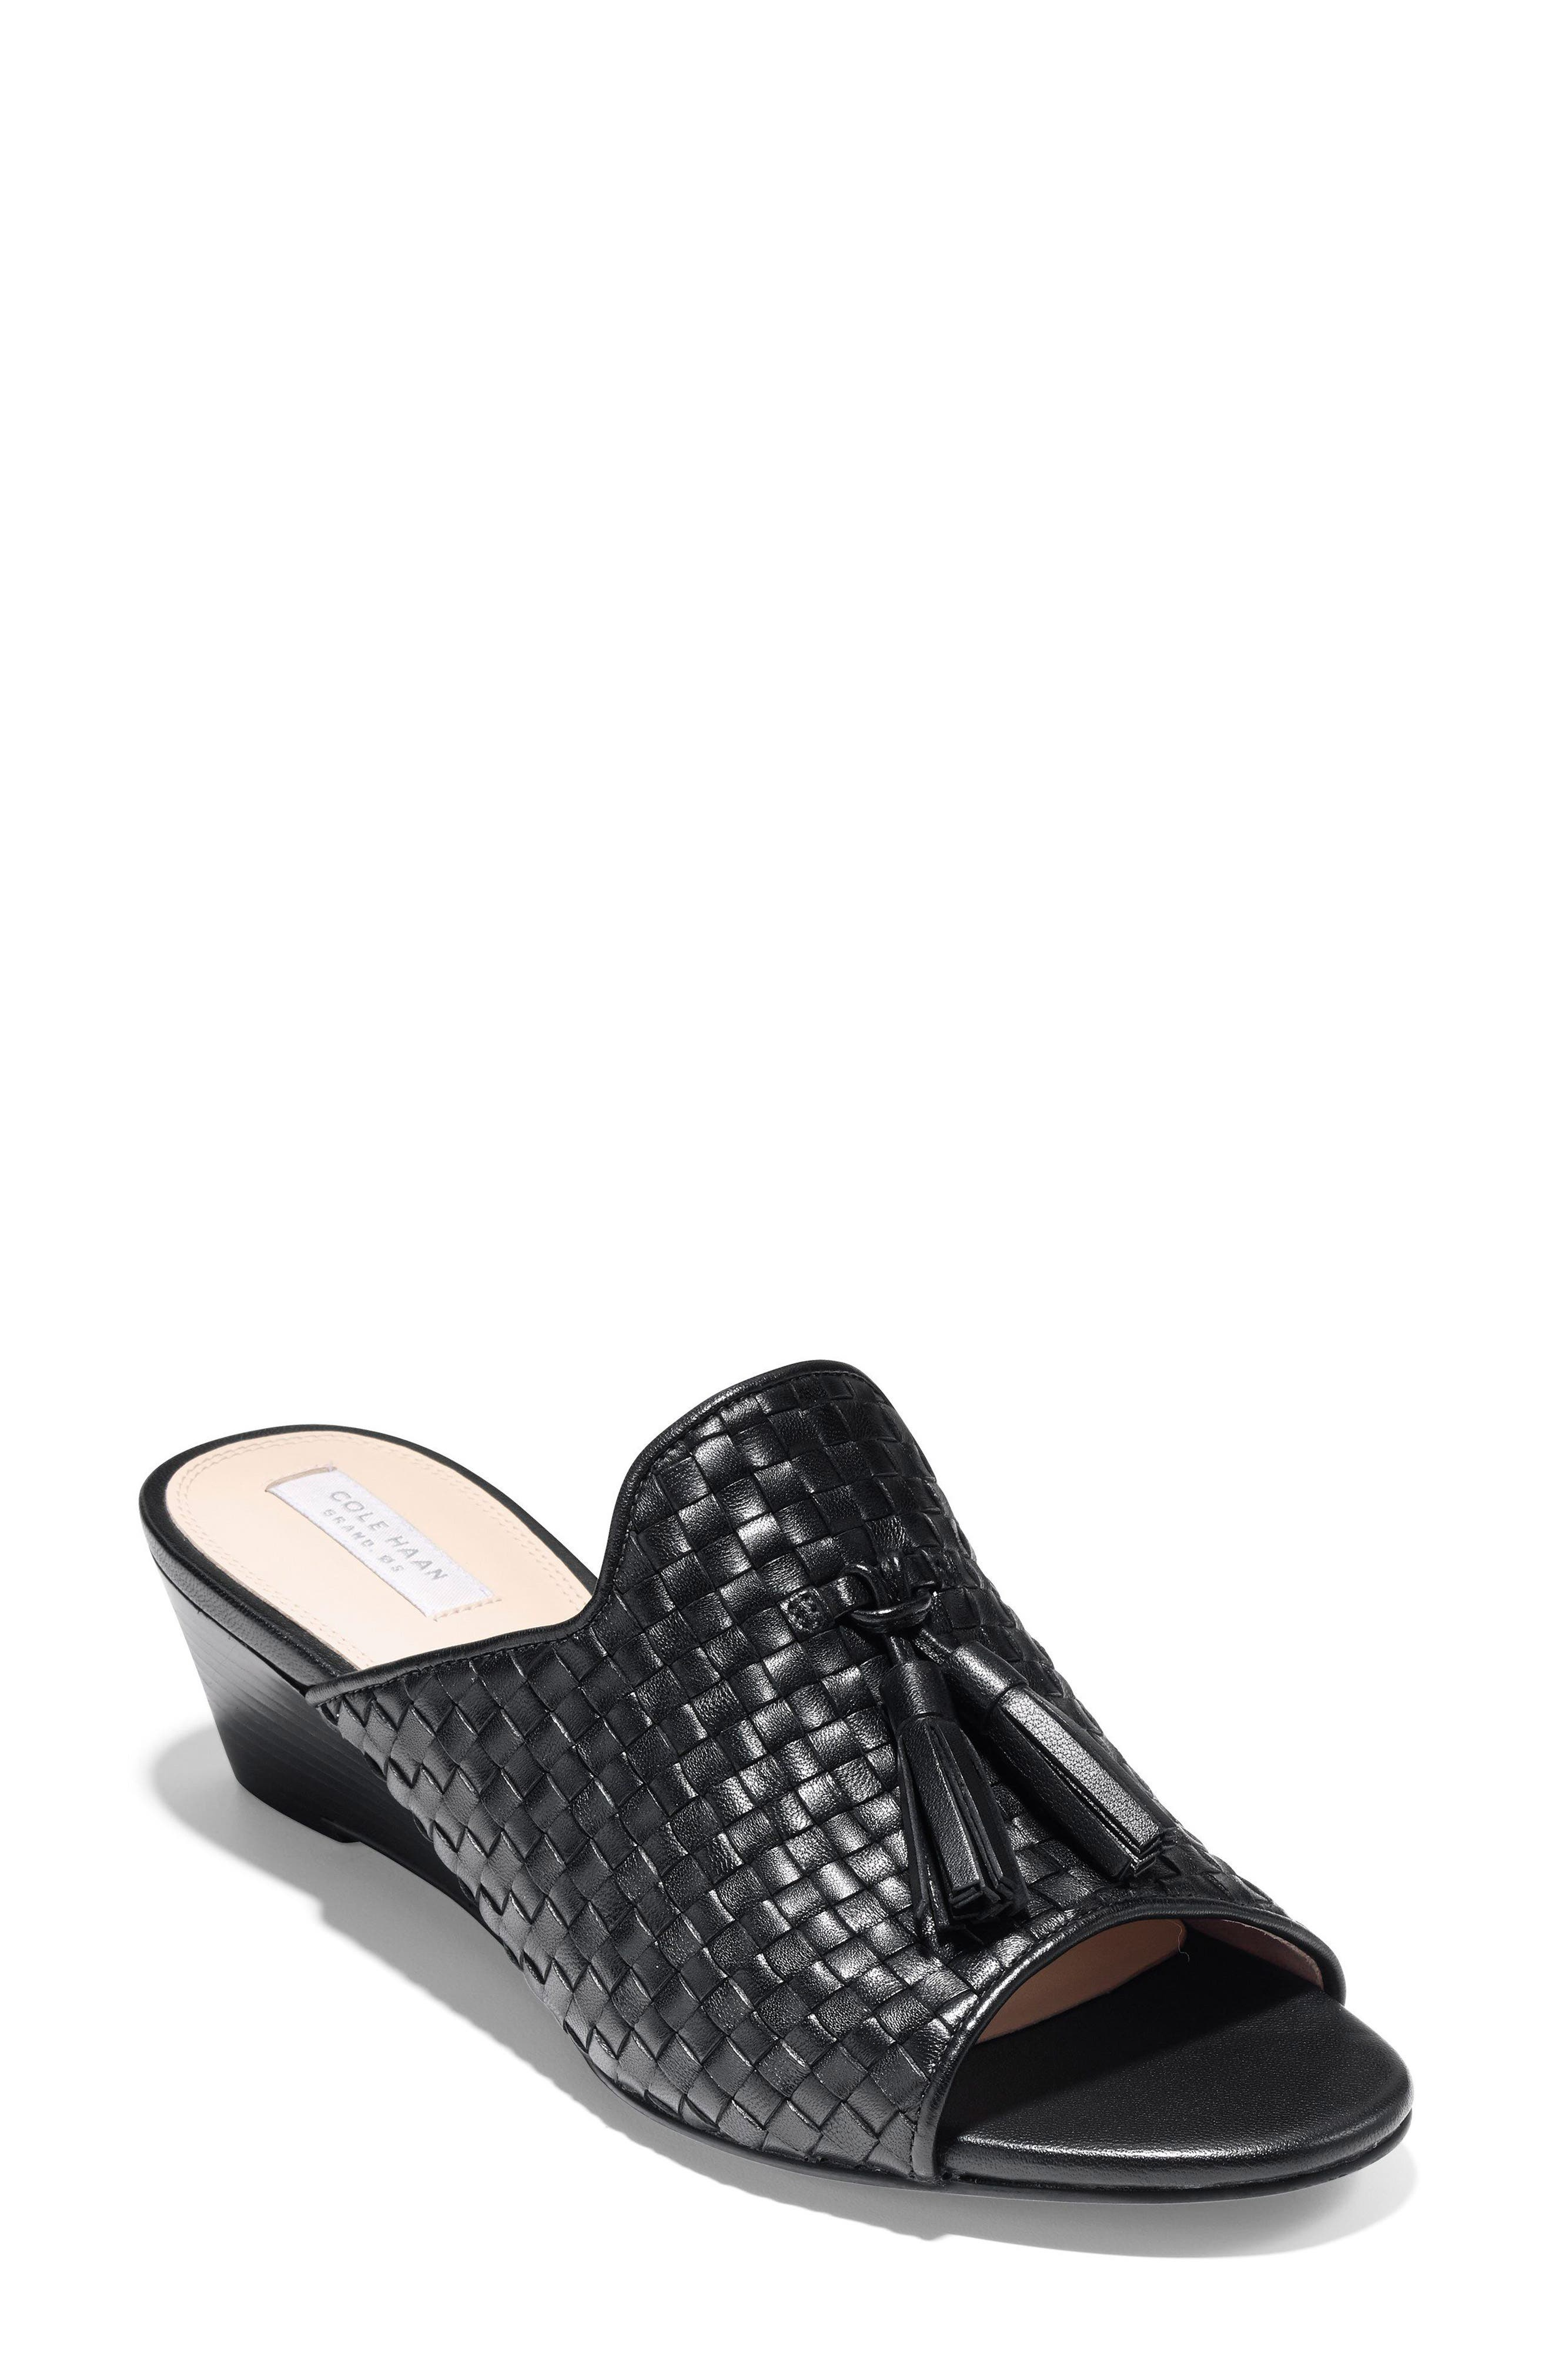 Jagger Wedge Sandal,                         Main,                         color,